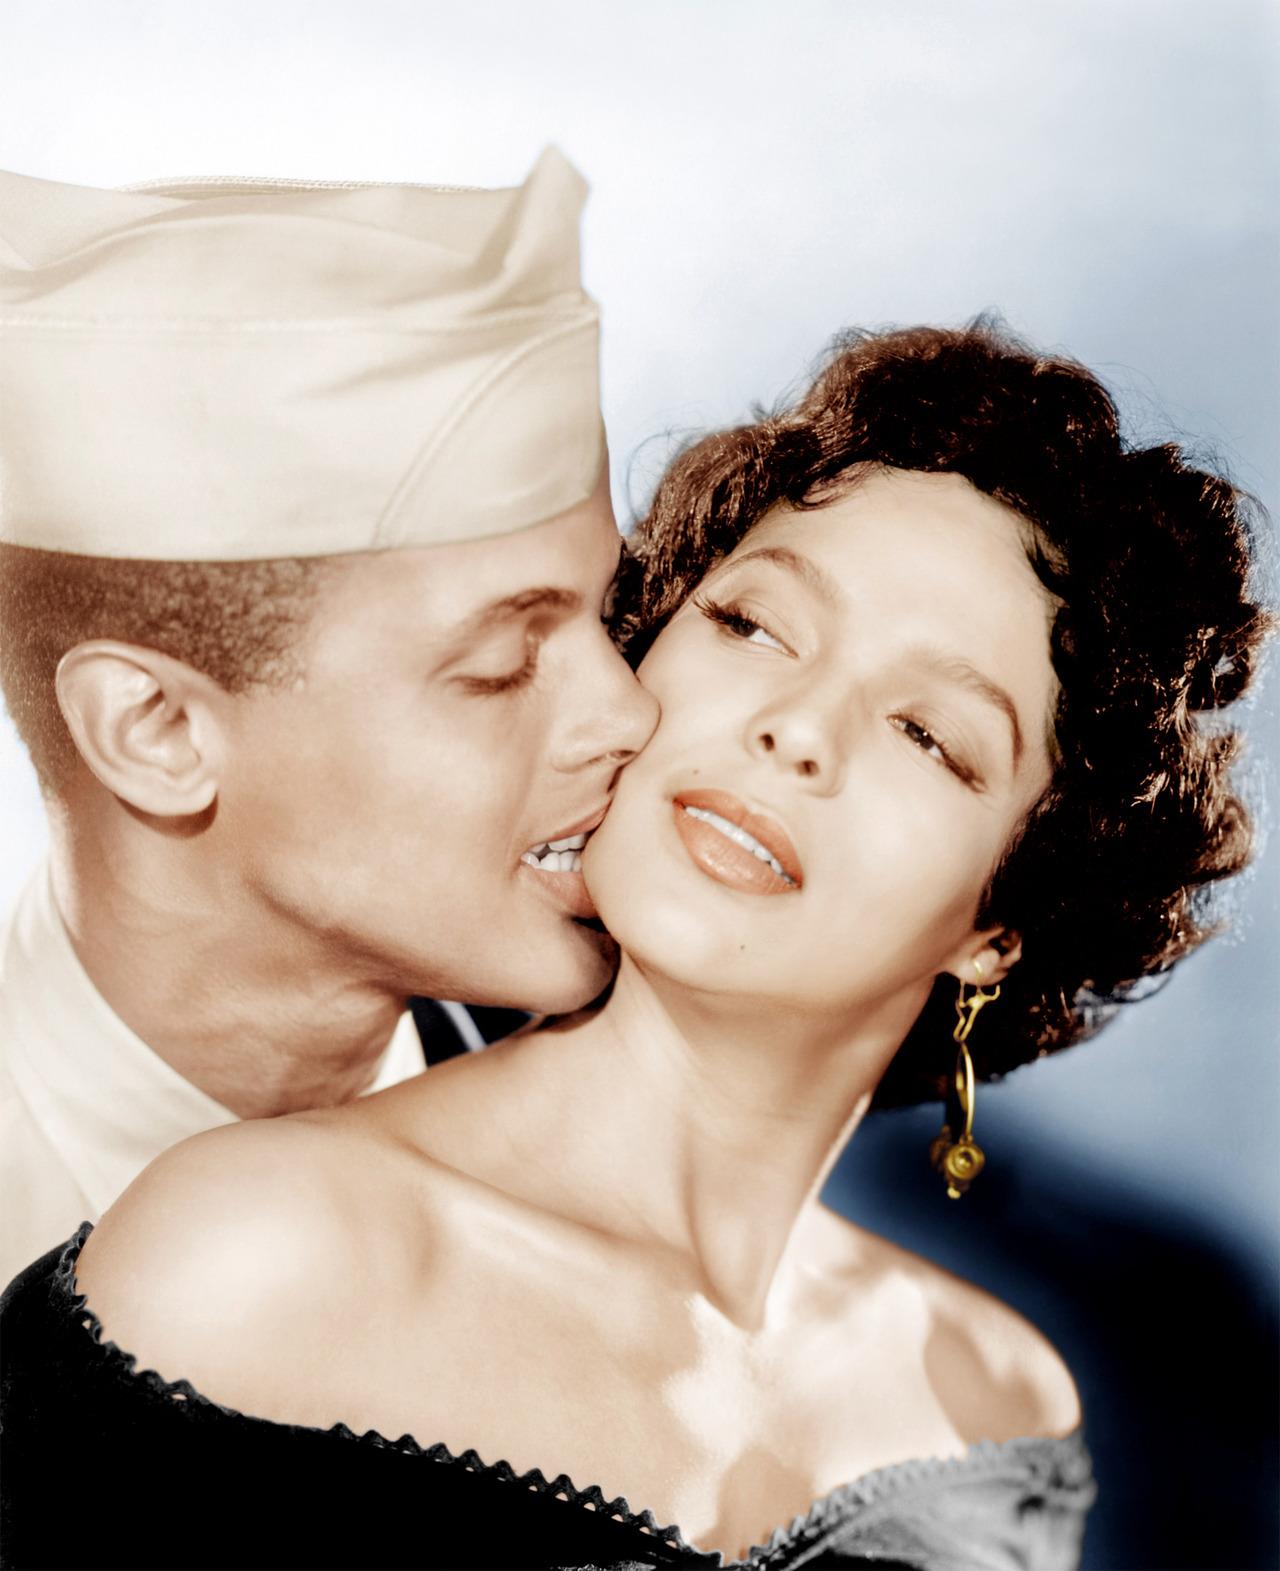 Harry Belafonte and Dorothy Dandridge,1954